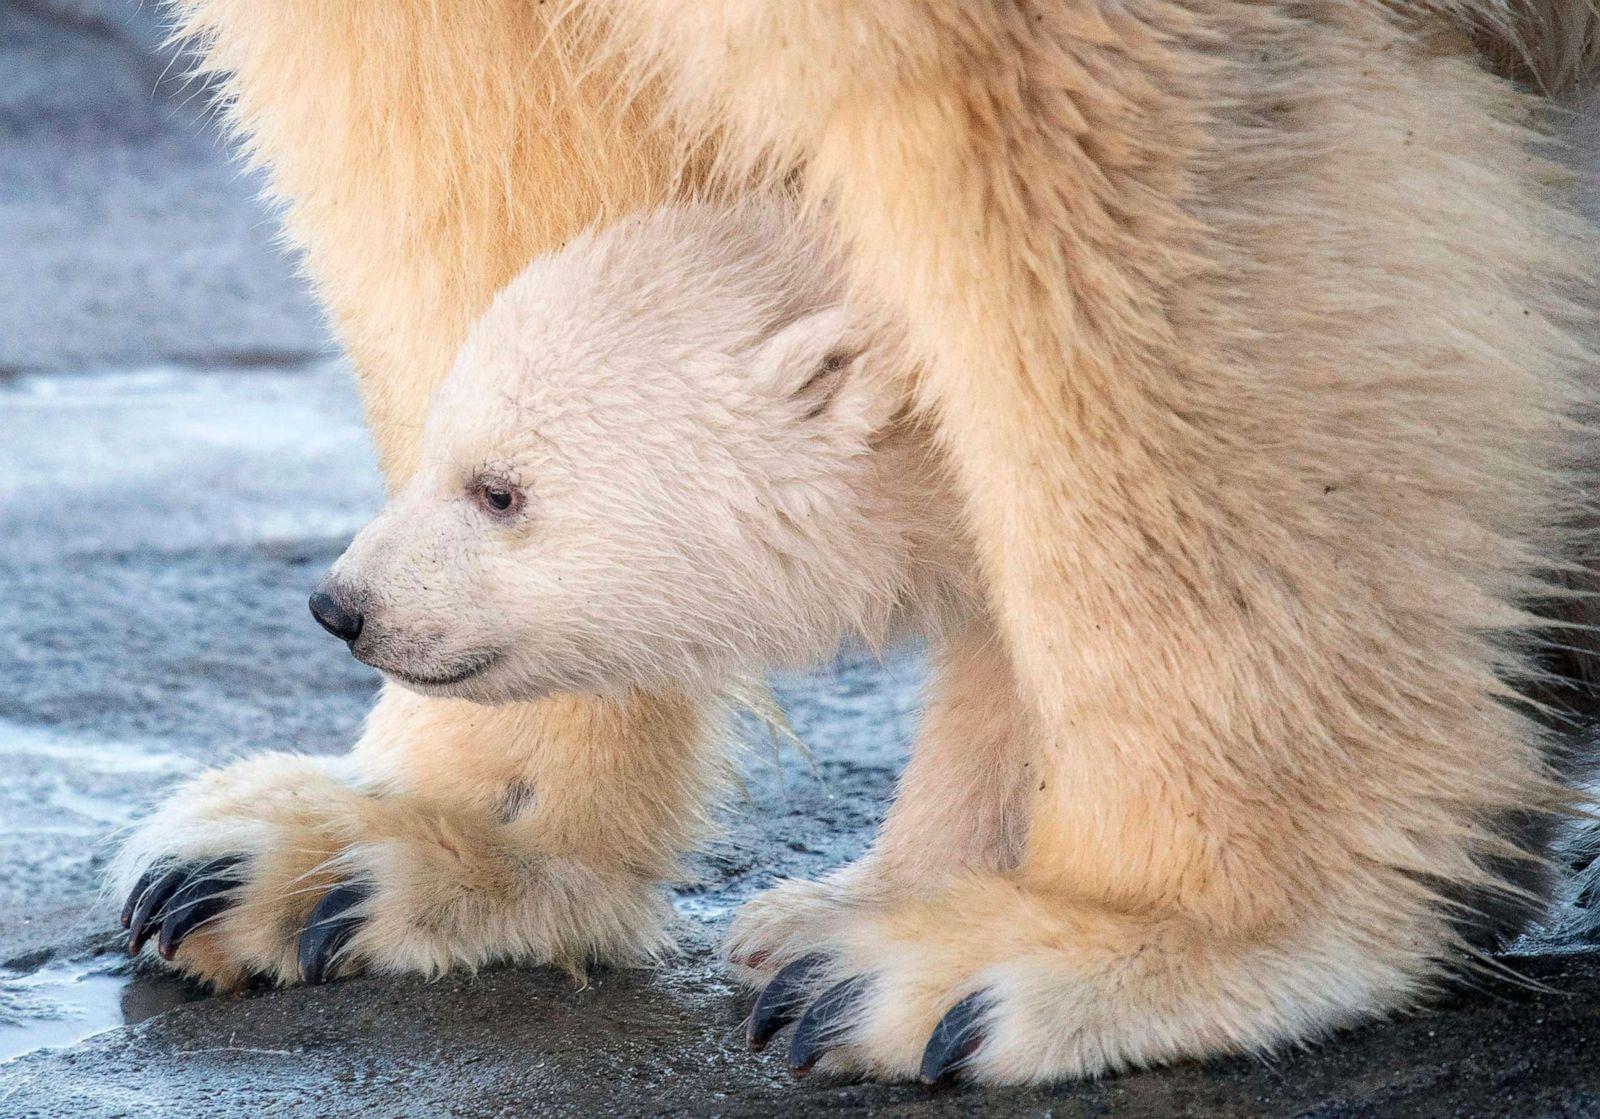 Polar bear cub hangs with mom